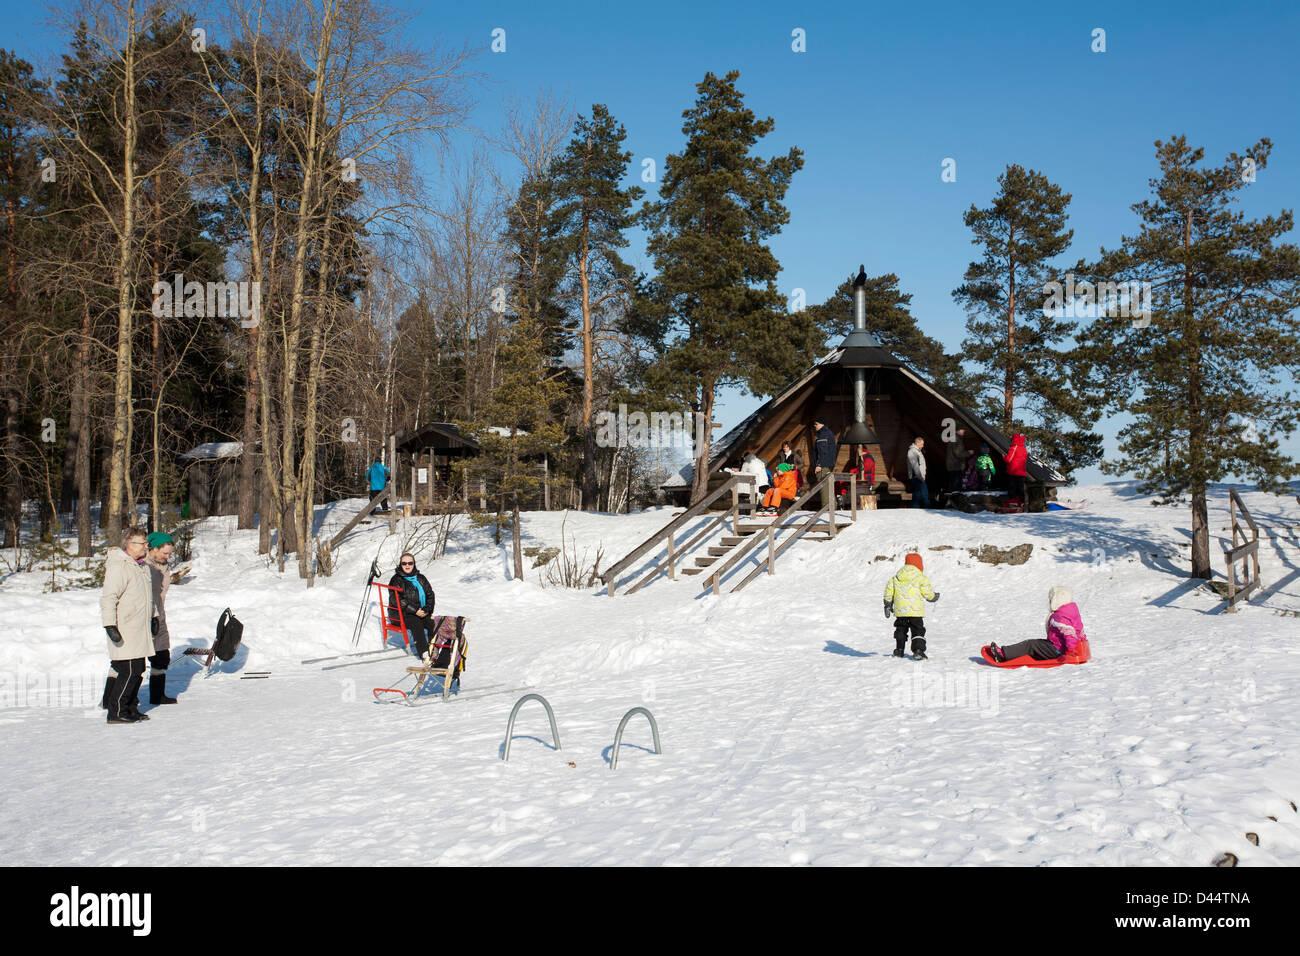 People enjoying sunny weather on the Karhusaari camping site, Lappeenranta Finland - Stock Image